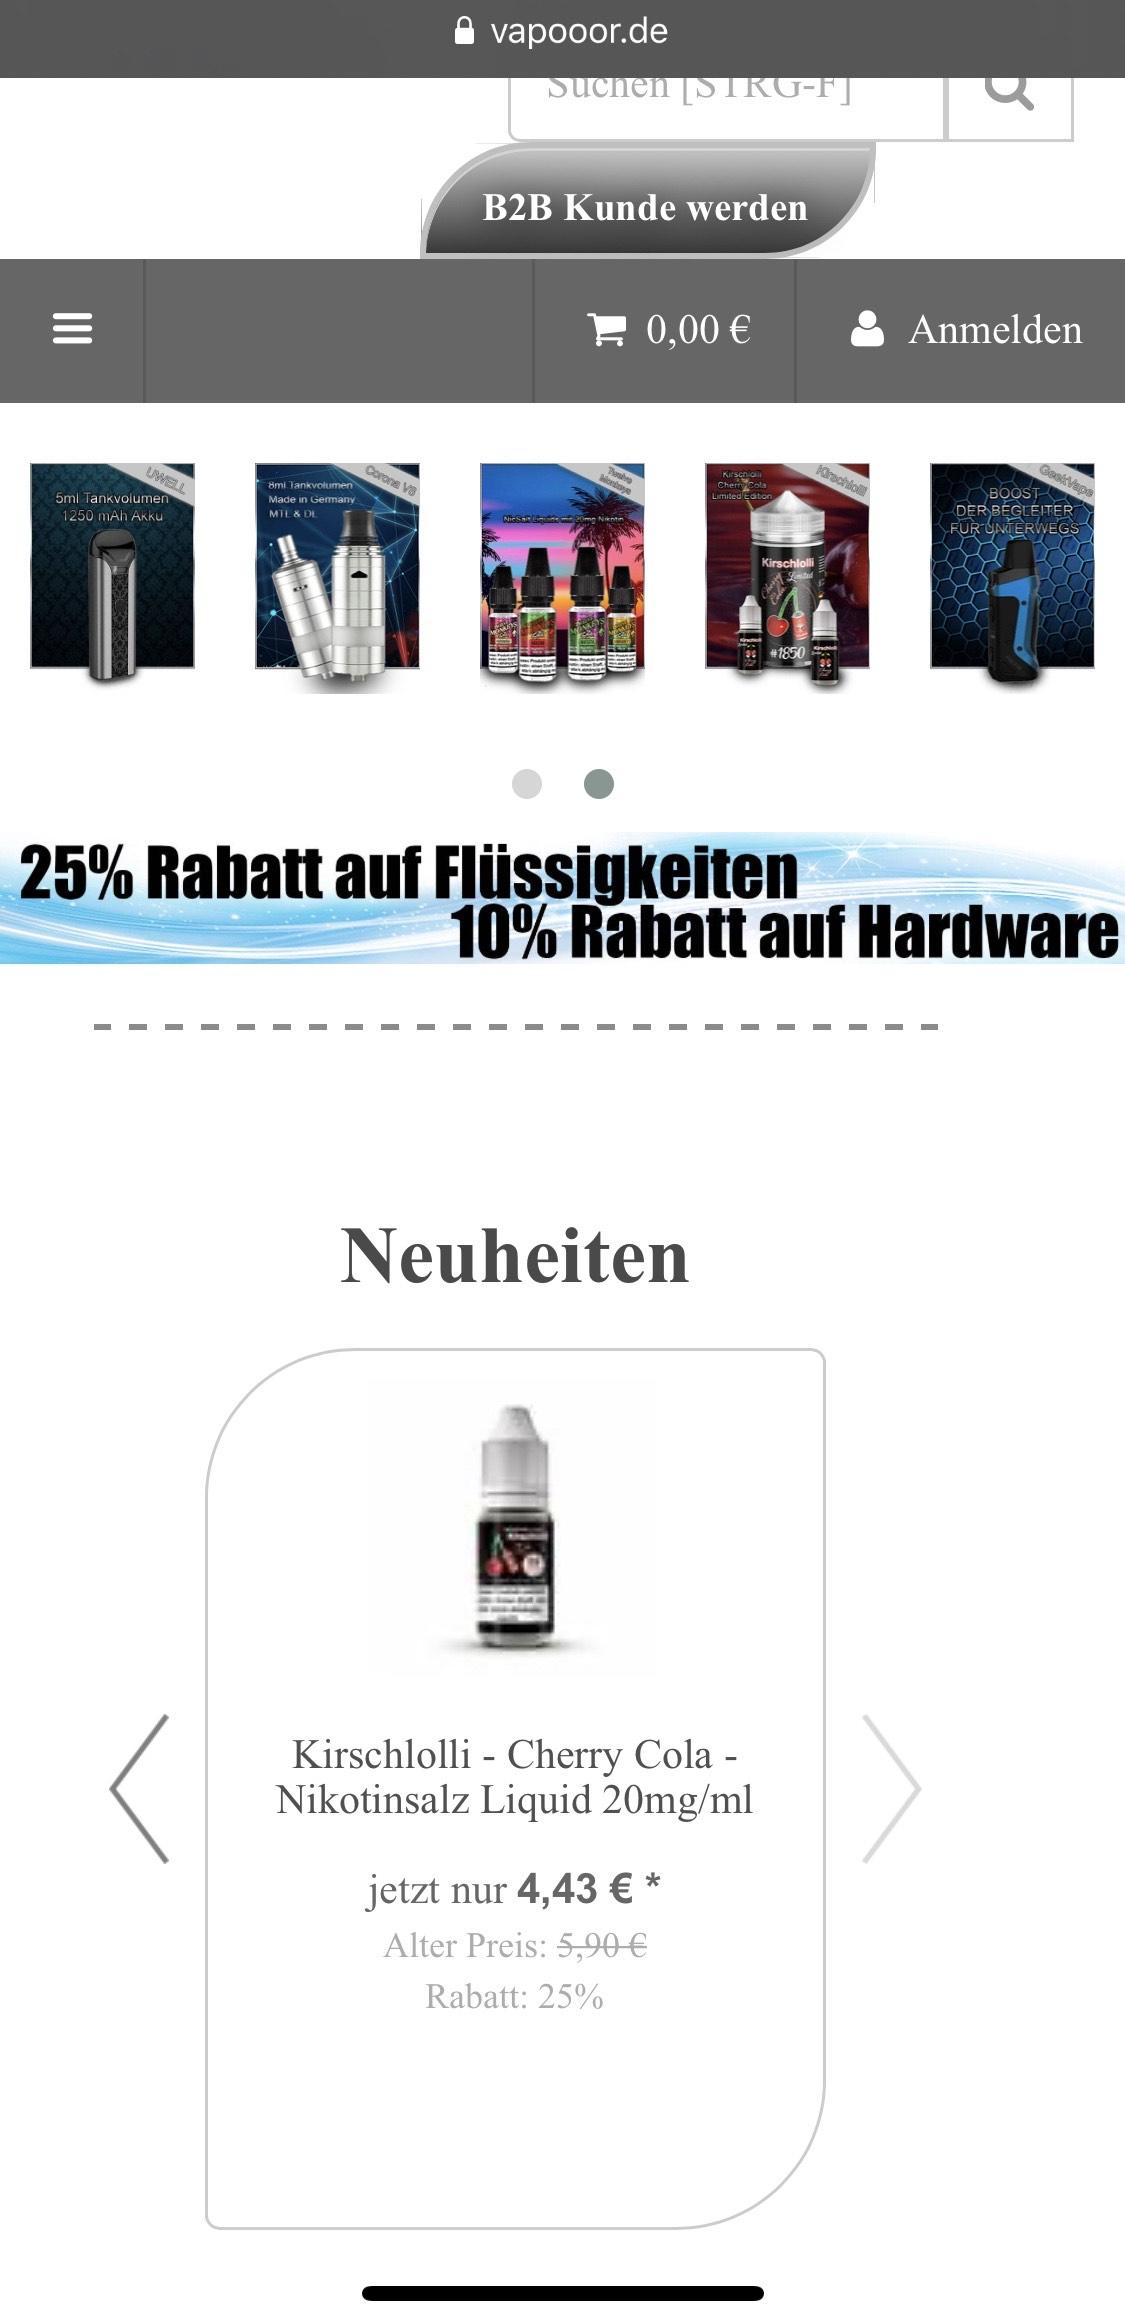 vapooor.de 25% und 10% Rabatt auf Verdampfer, Dampfer, Liquid, Aroma E Zigaretten